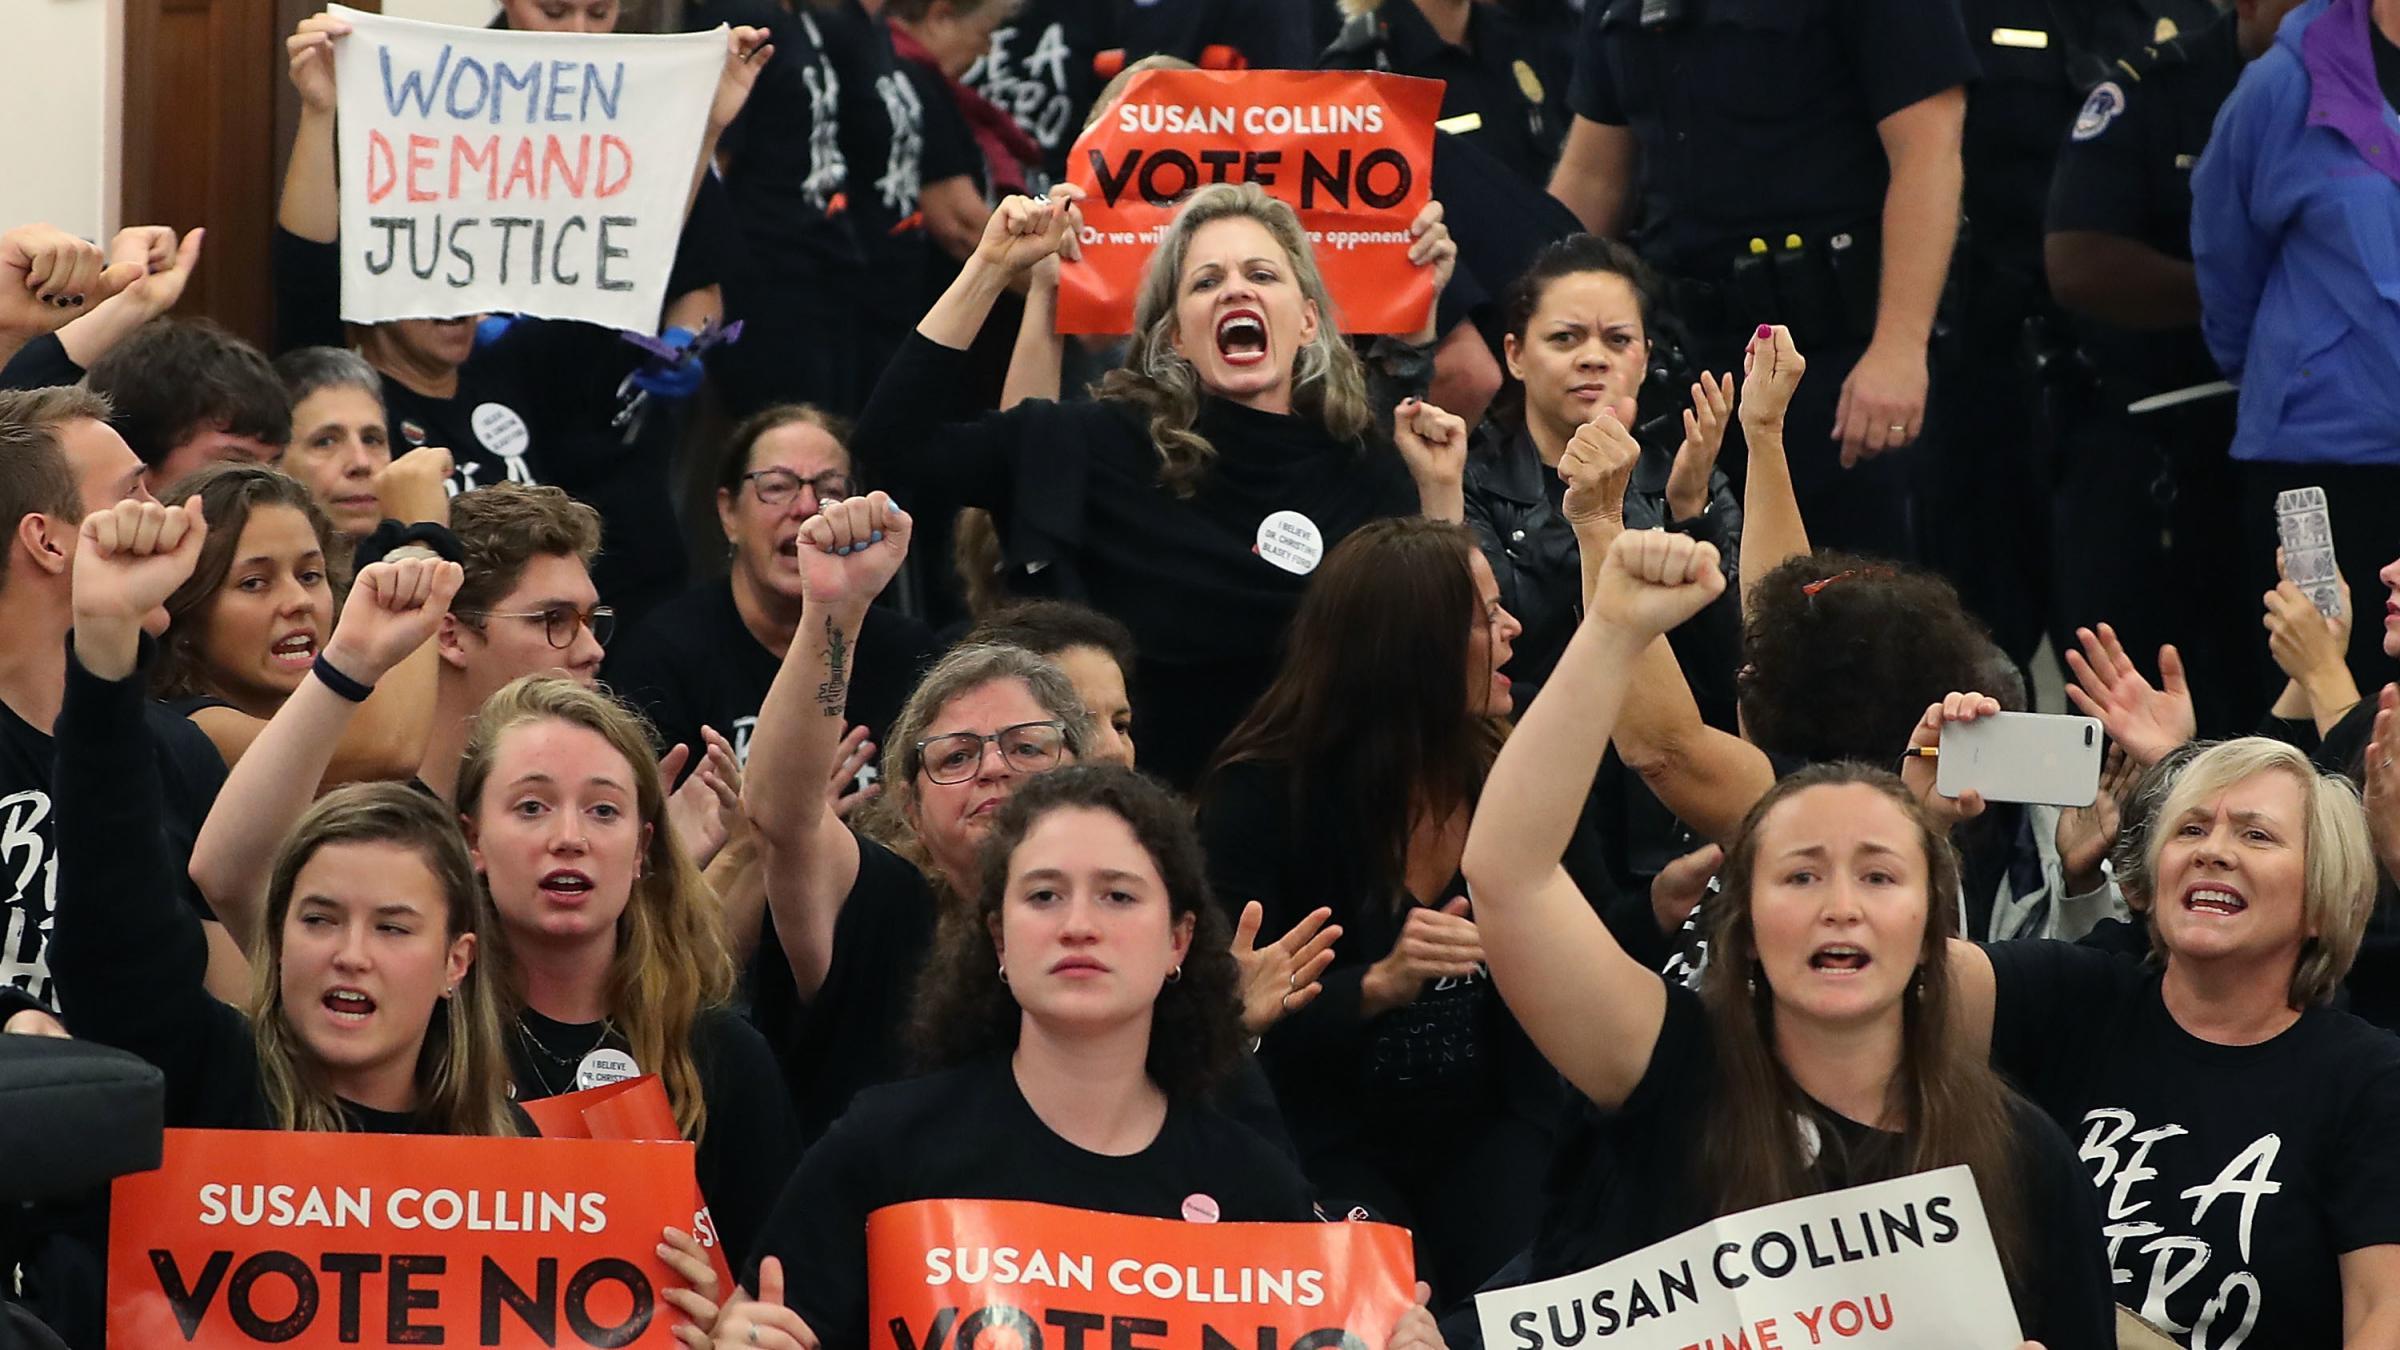 Trump's Supreme Court nominee Kavanaugh rejects 'false accusations'